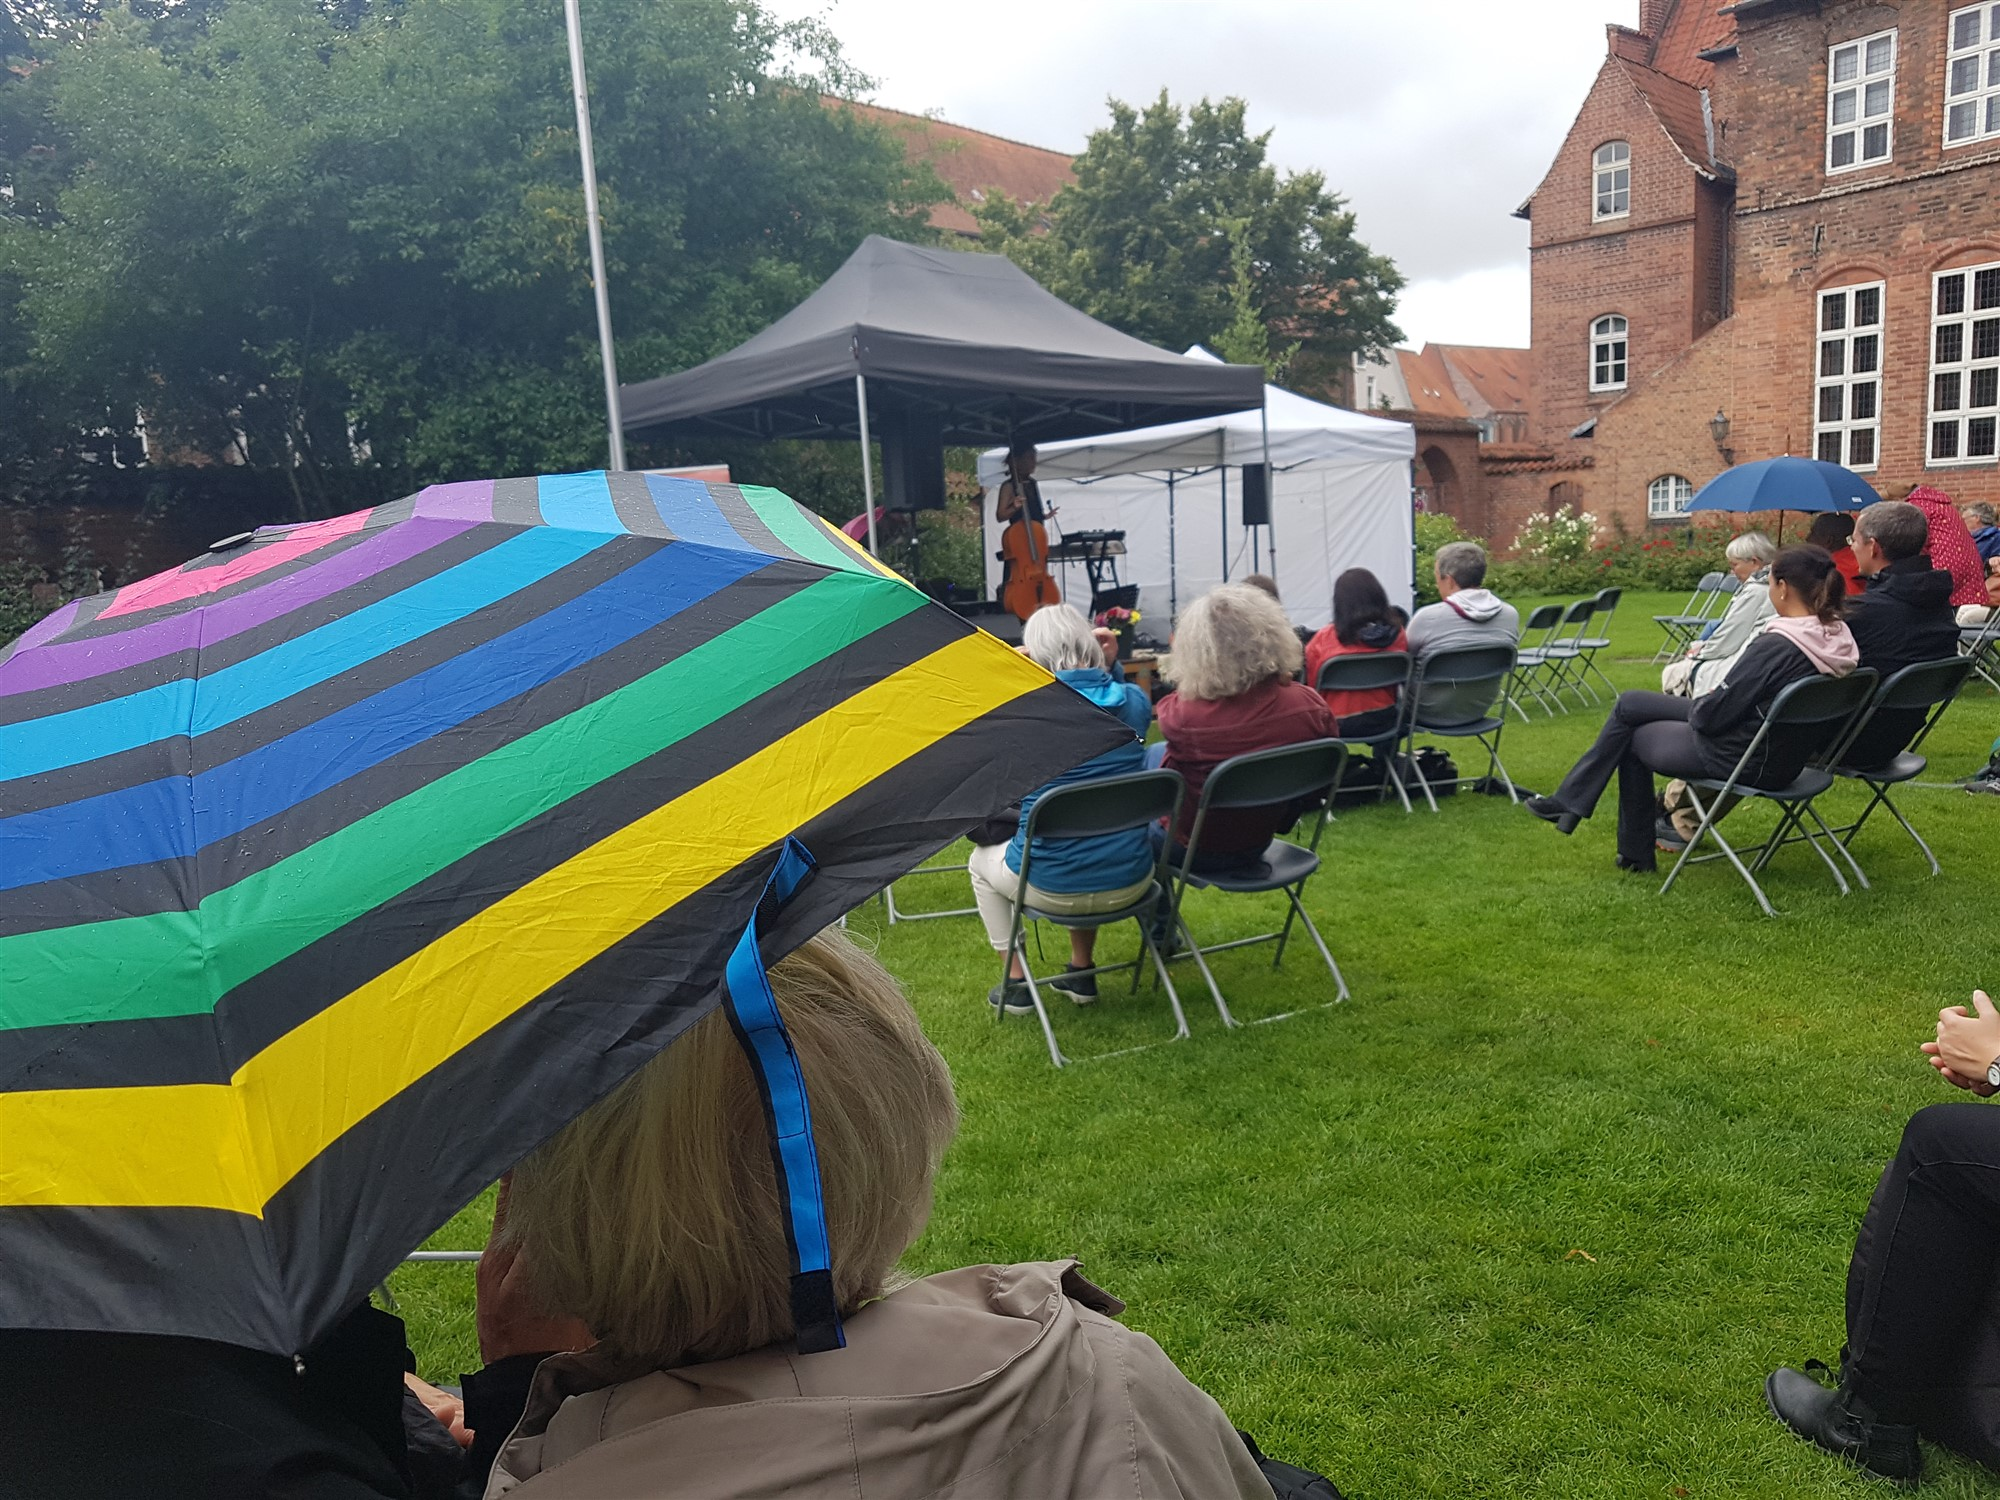 2021-08-28_Rathausgarten-Sommerfestival (2)